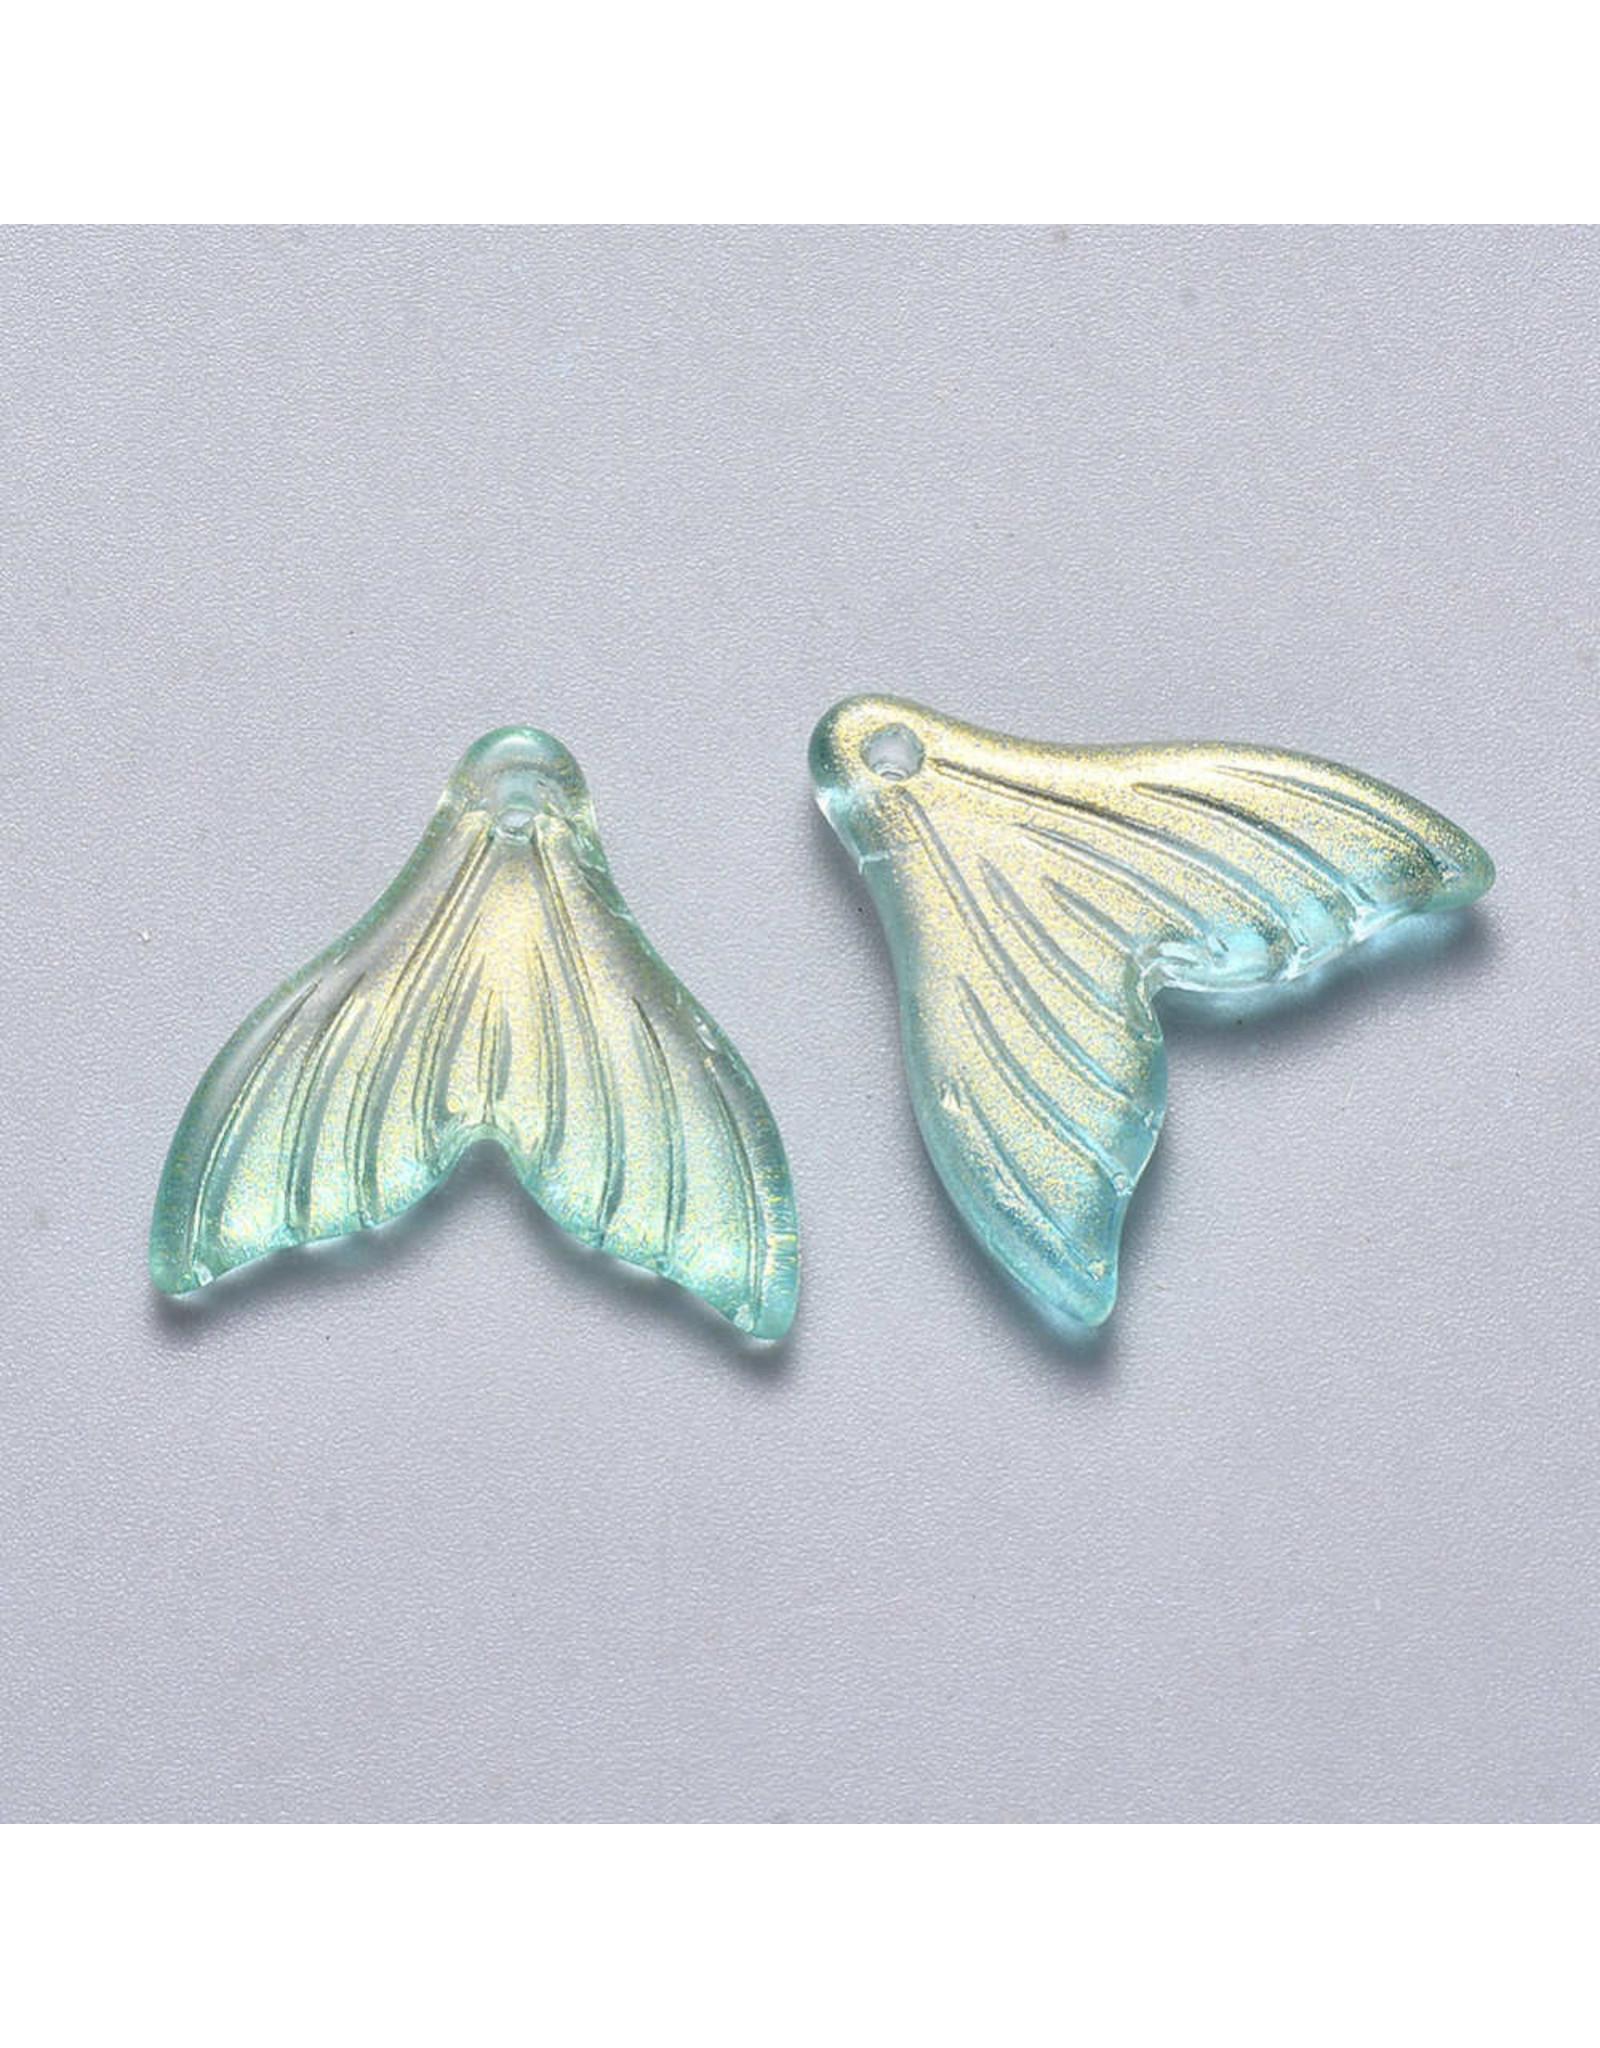 19x19x3mm Glass Mermaid Tail Turquoise Blue  x6